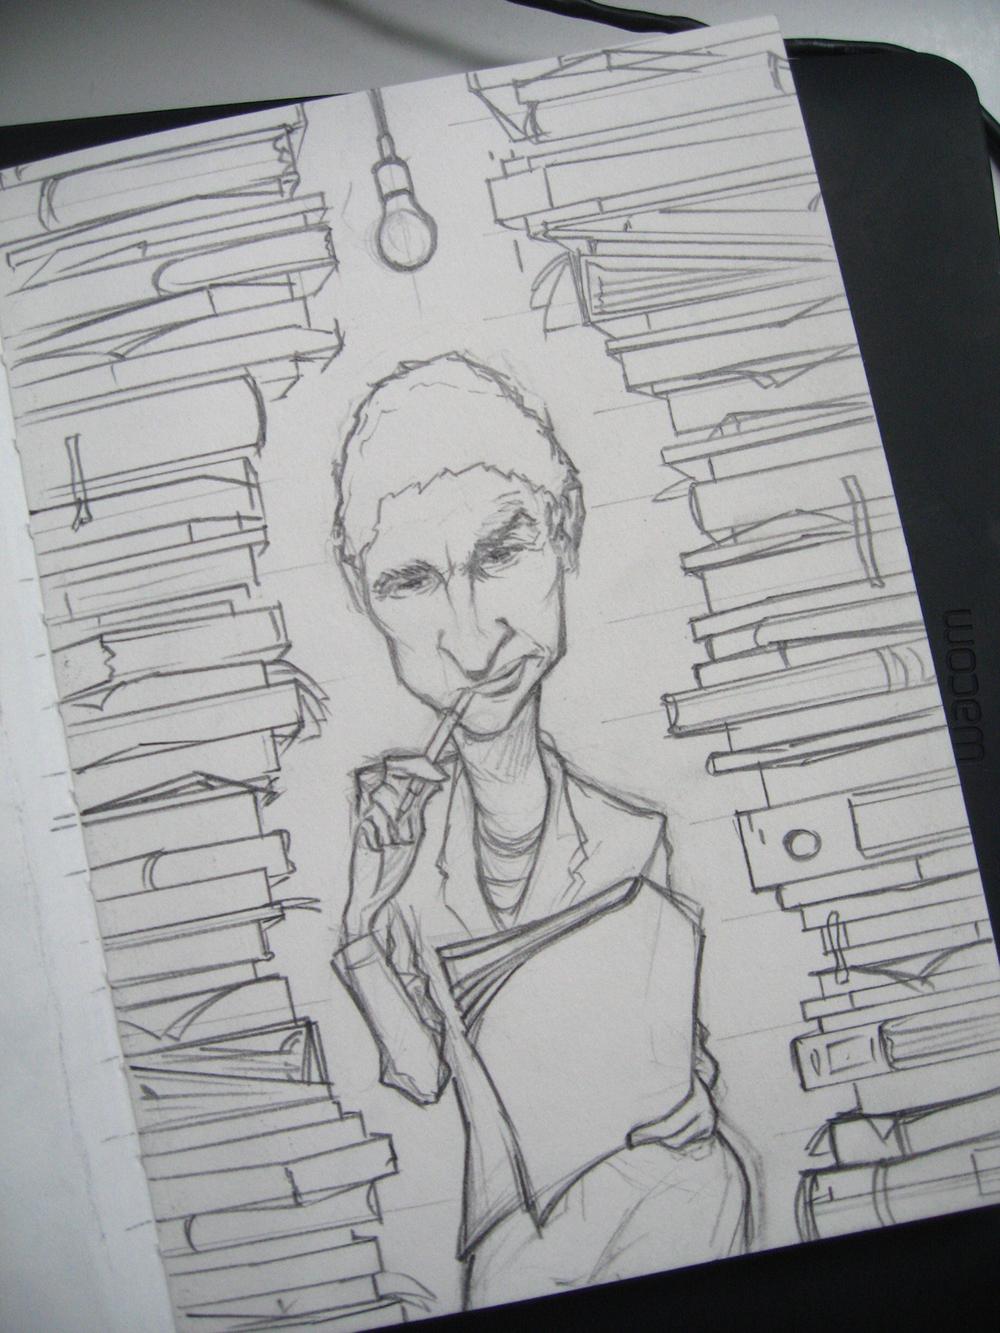 141027_Trouw_Wilma_Mansveld_Karikatuur_Schets_Lennart_Gaebel.jpg